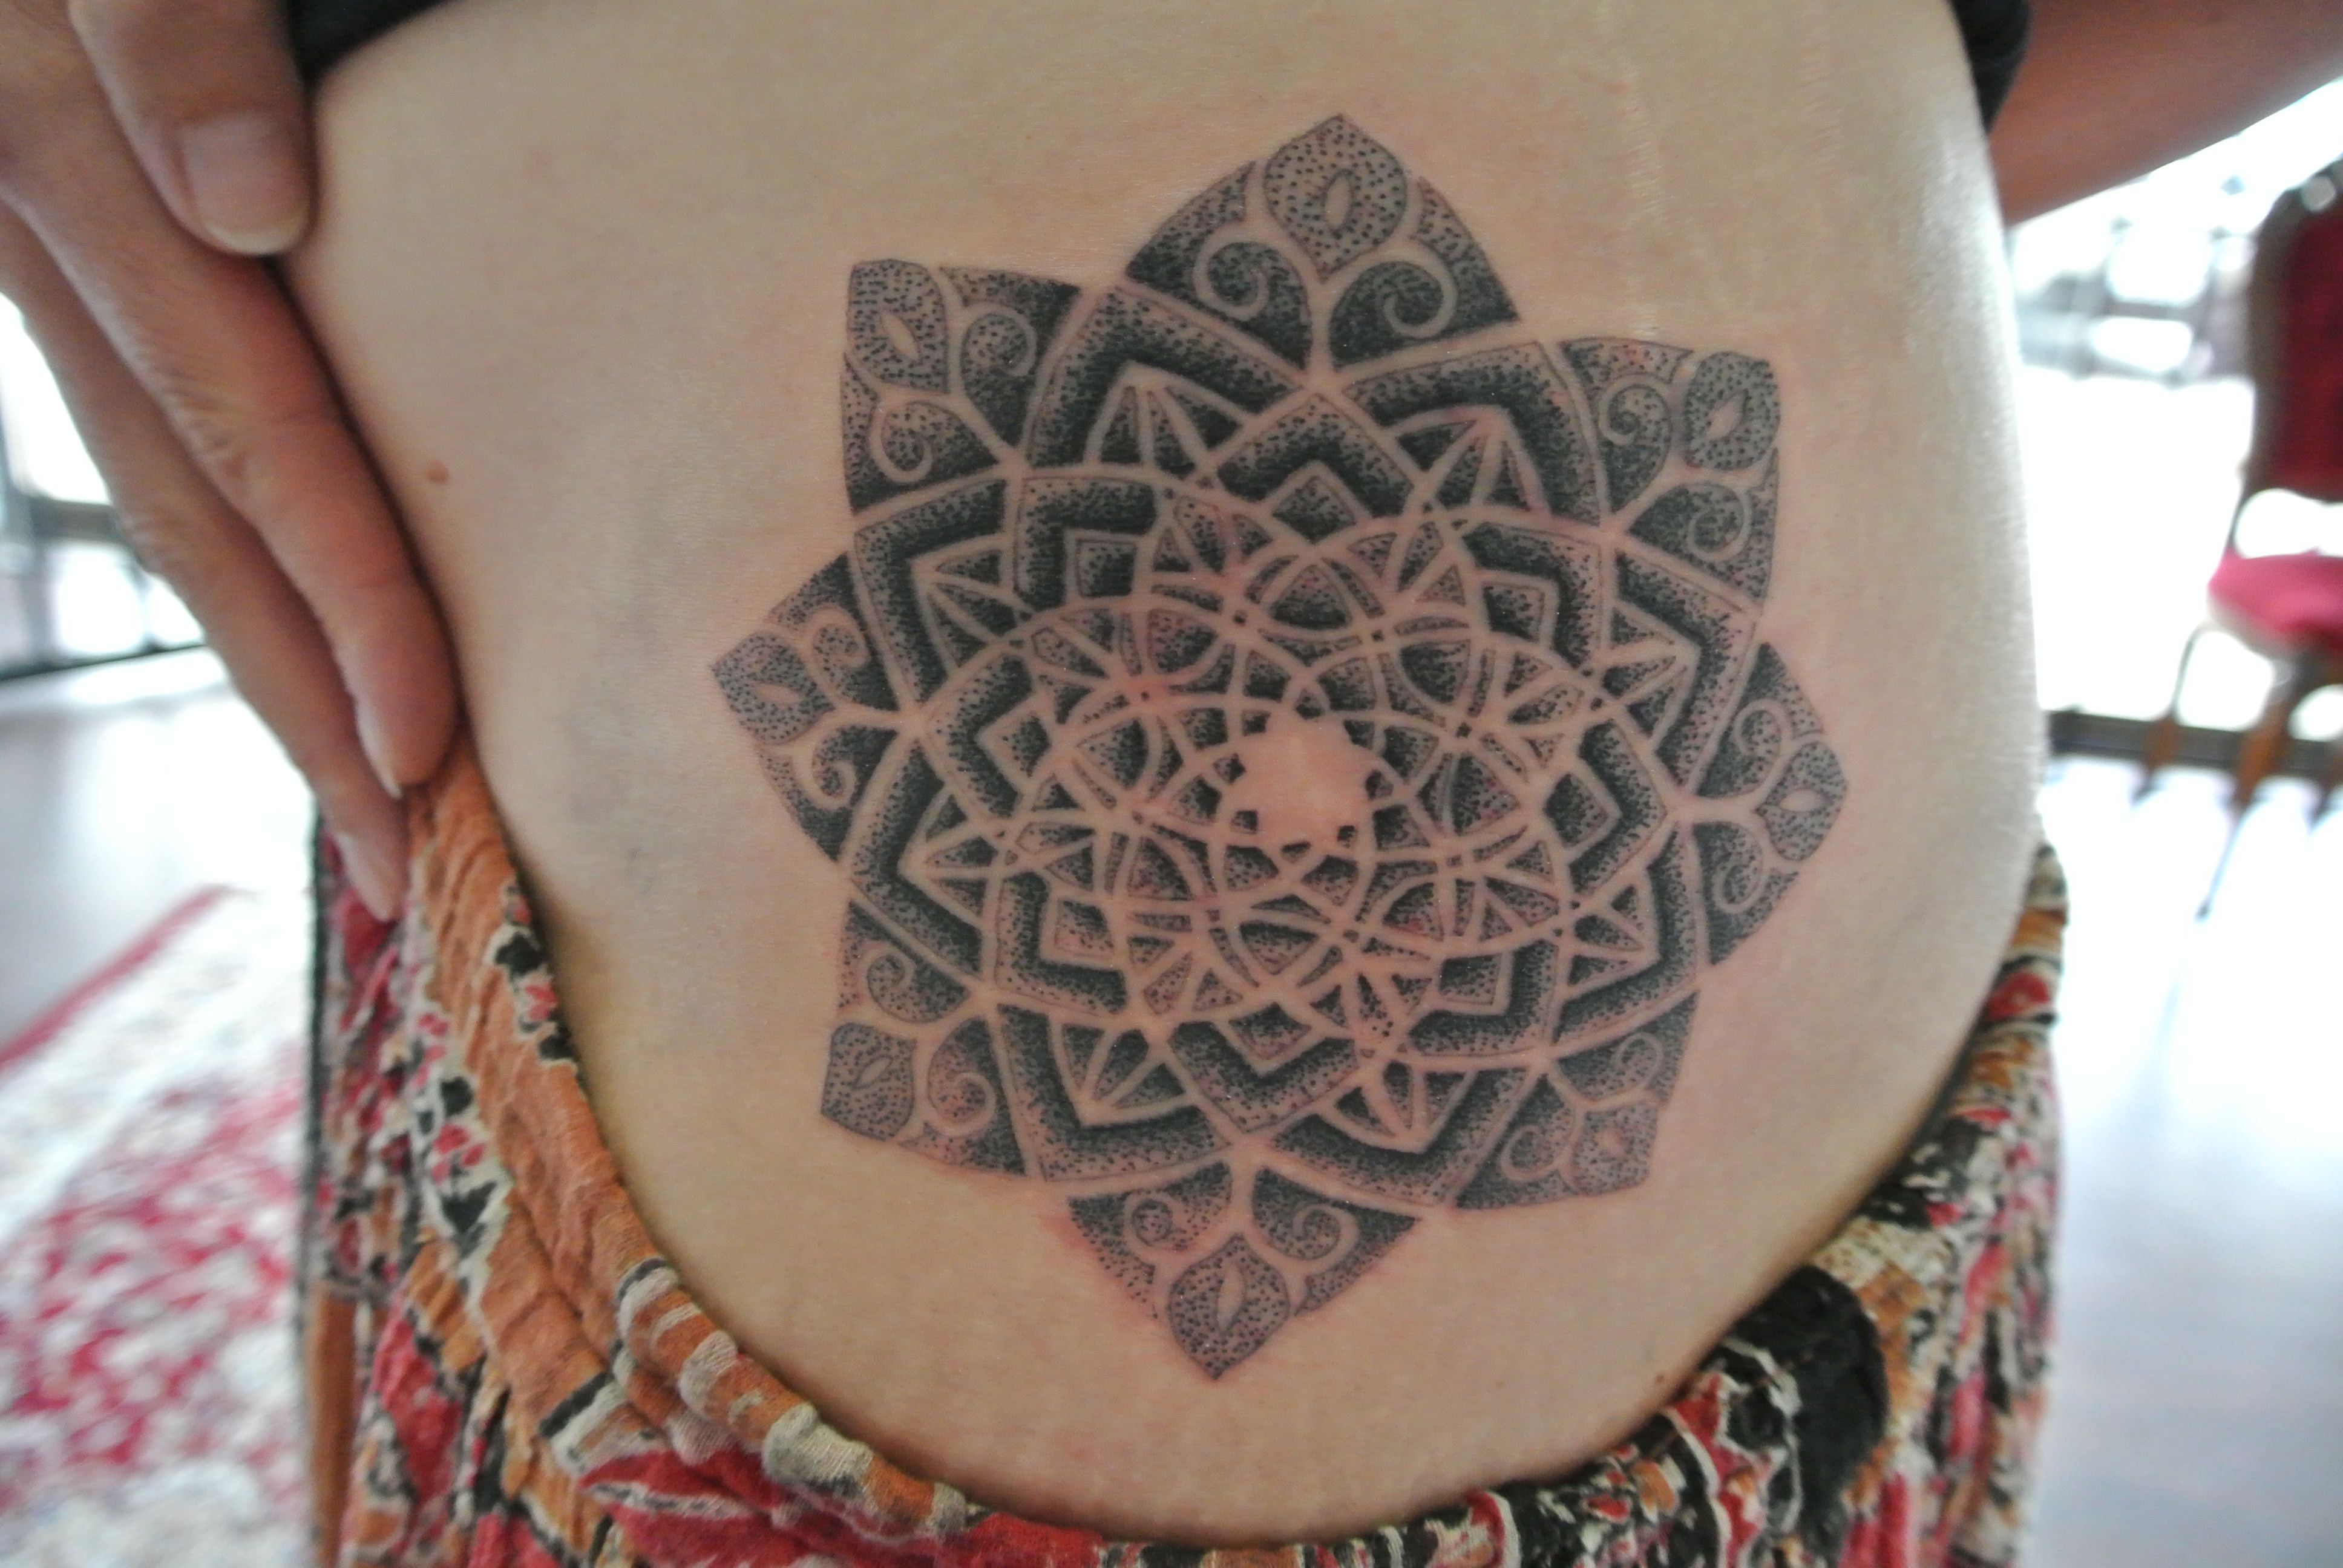 Tattoo By Lou Shaw Four Aces Tattoo Aldinga Beach South Australia 8556 5467 Mandala Done In Dots For A Stipple Effect Ace Tattoo Geometric Tattoo Tattoos